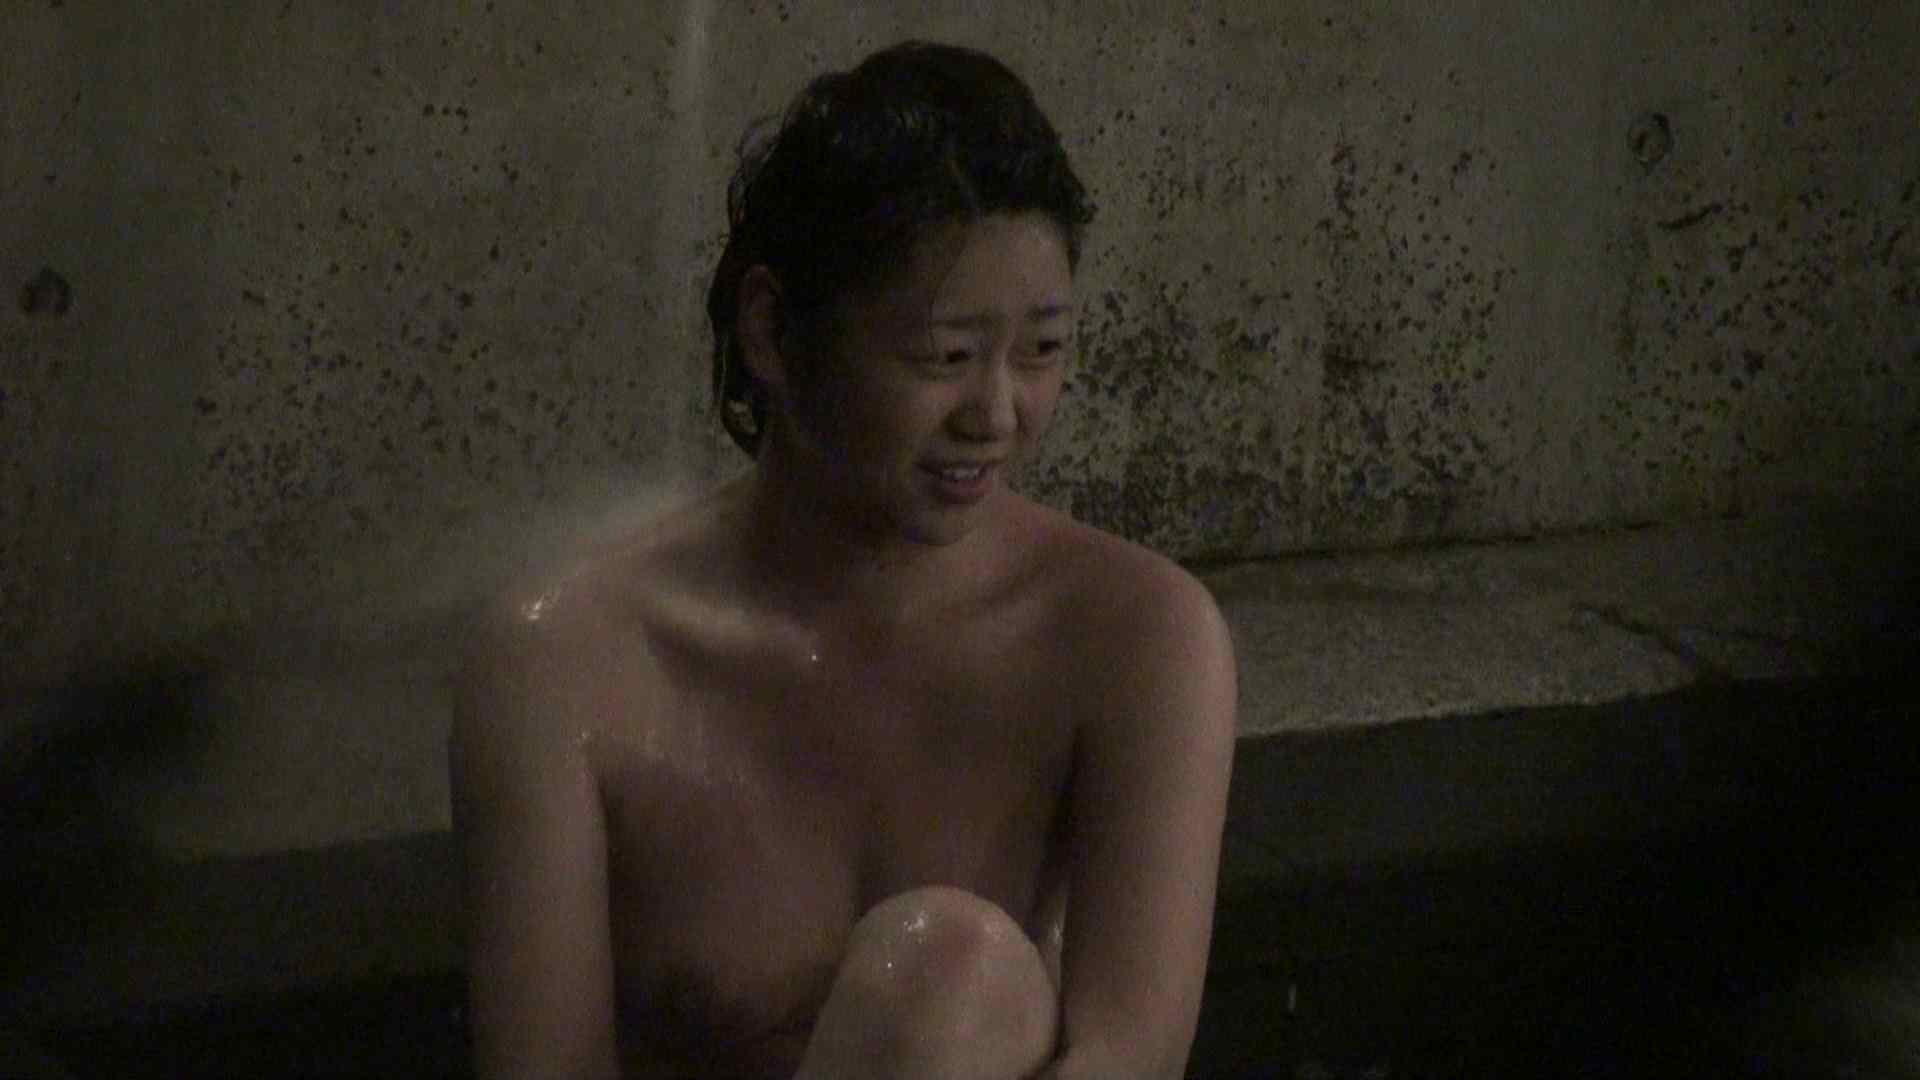 Aquaな露天風呂Vol.342 盗撮師作品  107pic 66